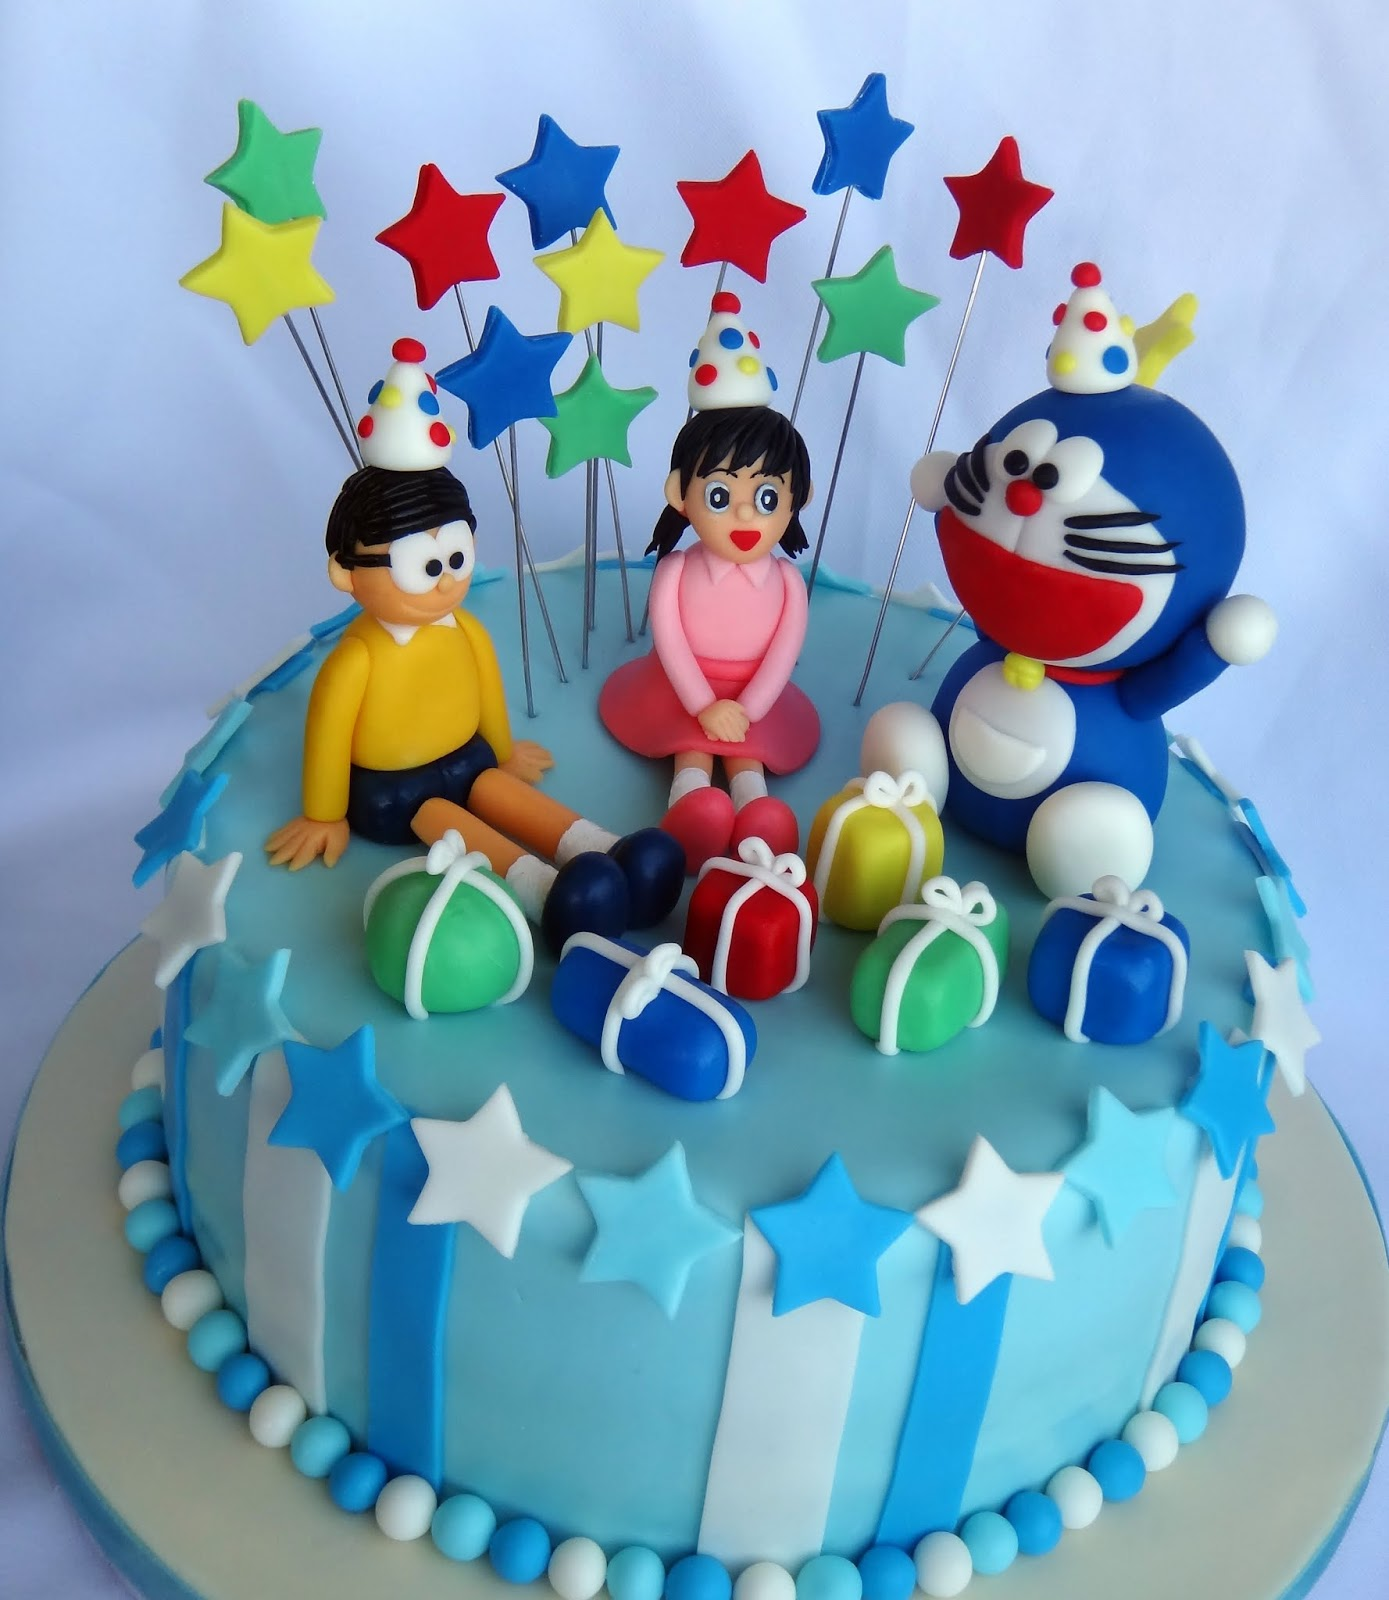 Birthday Cake Images Of Doraemon ~ Doraemon and friends cake pixshark images